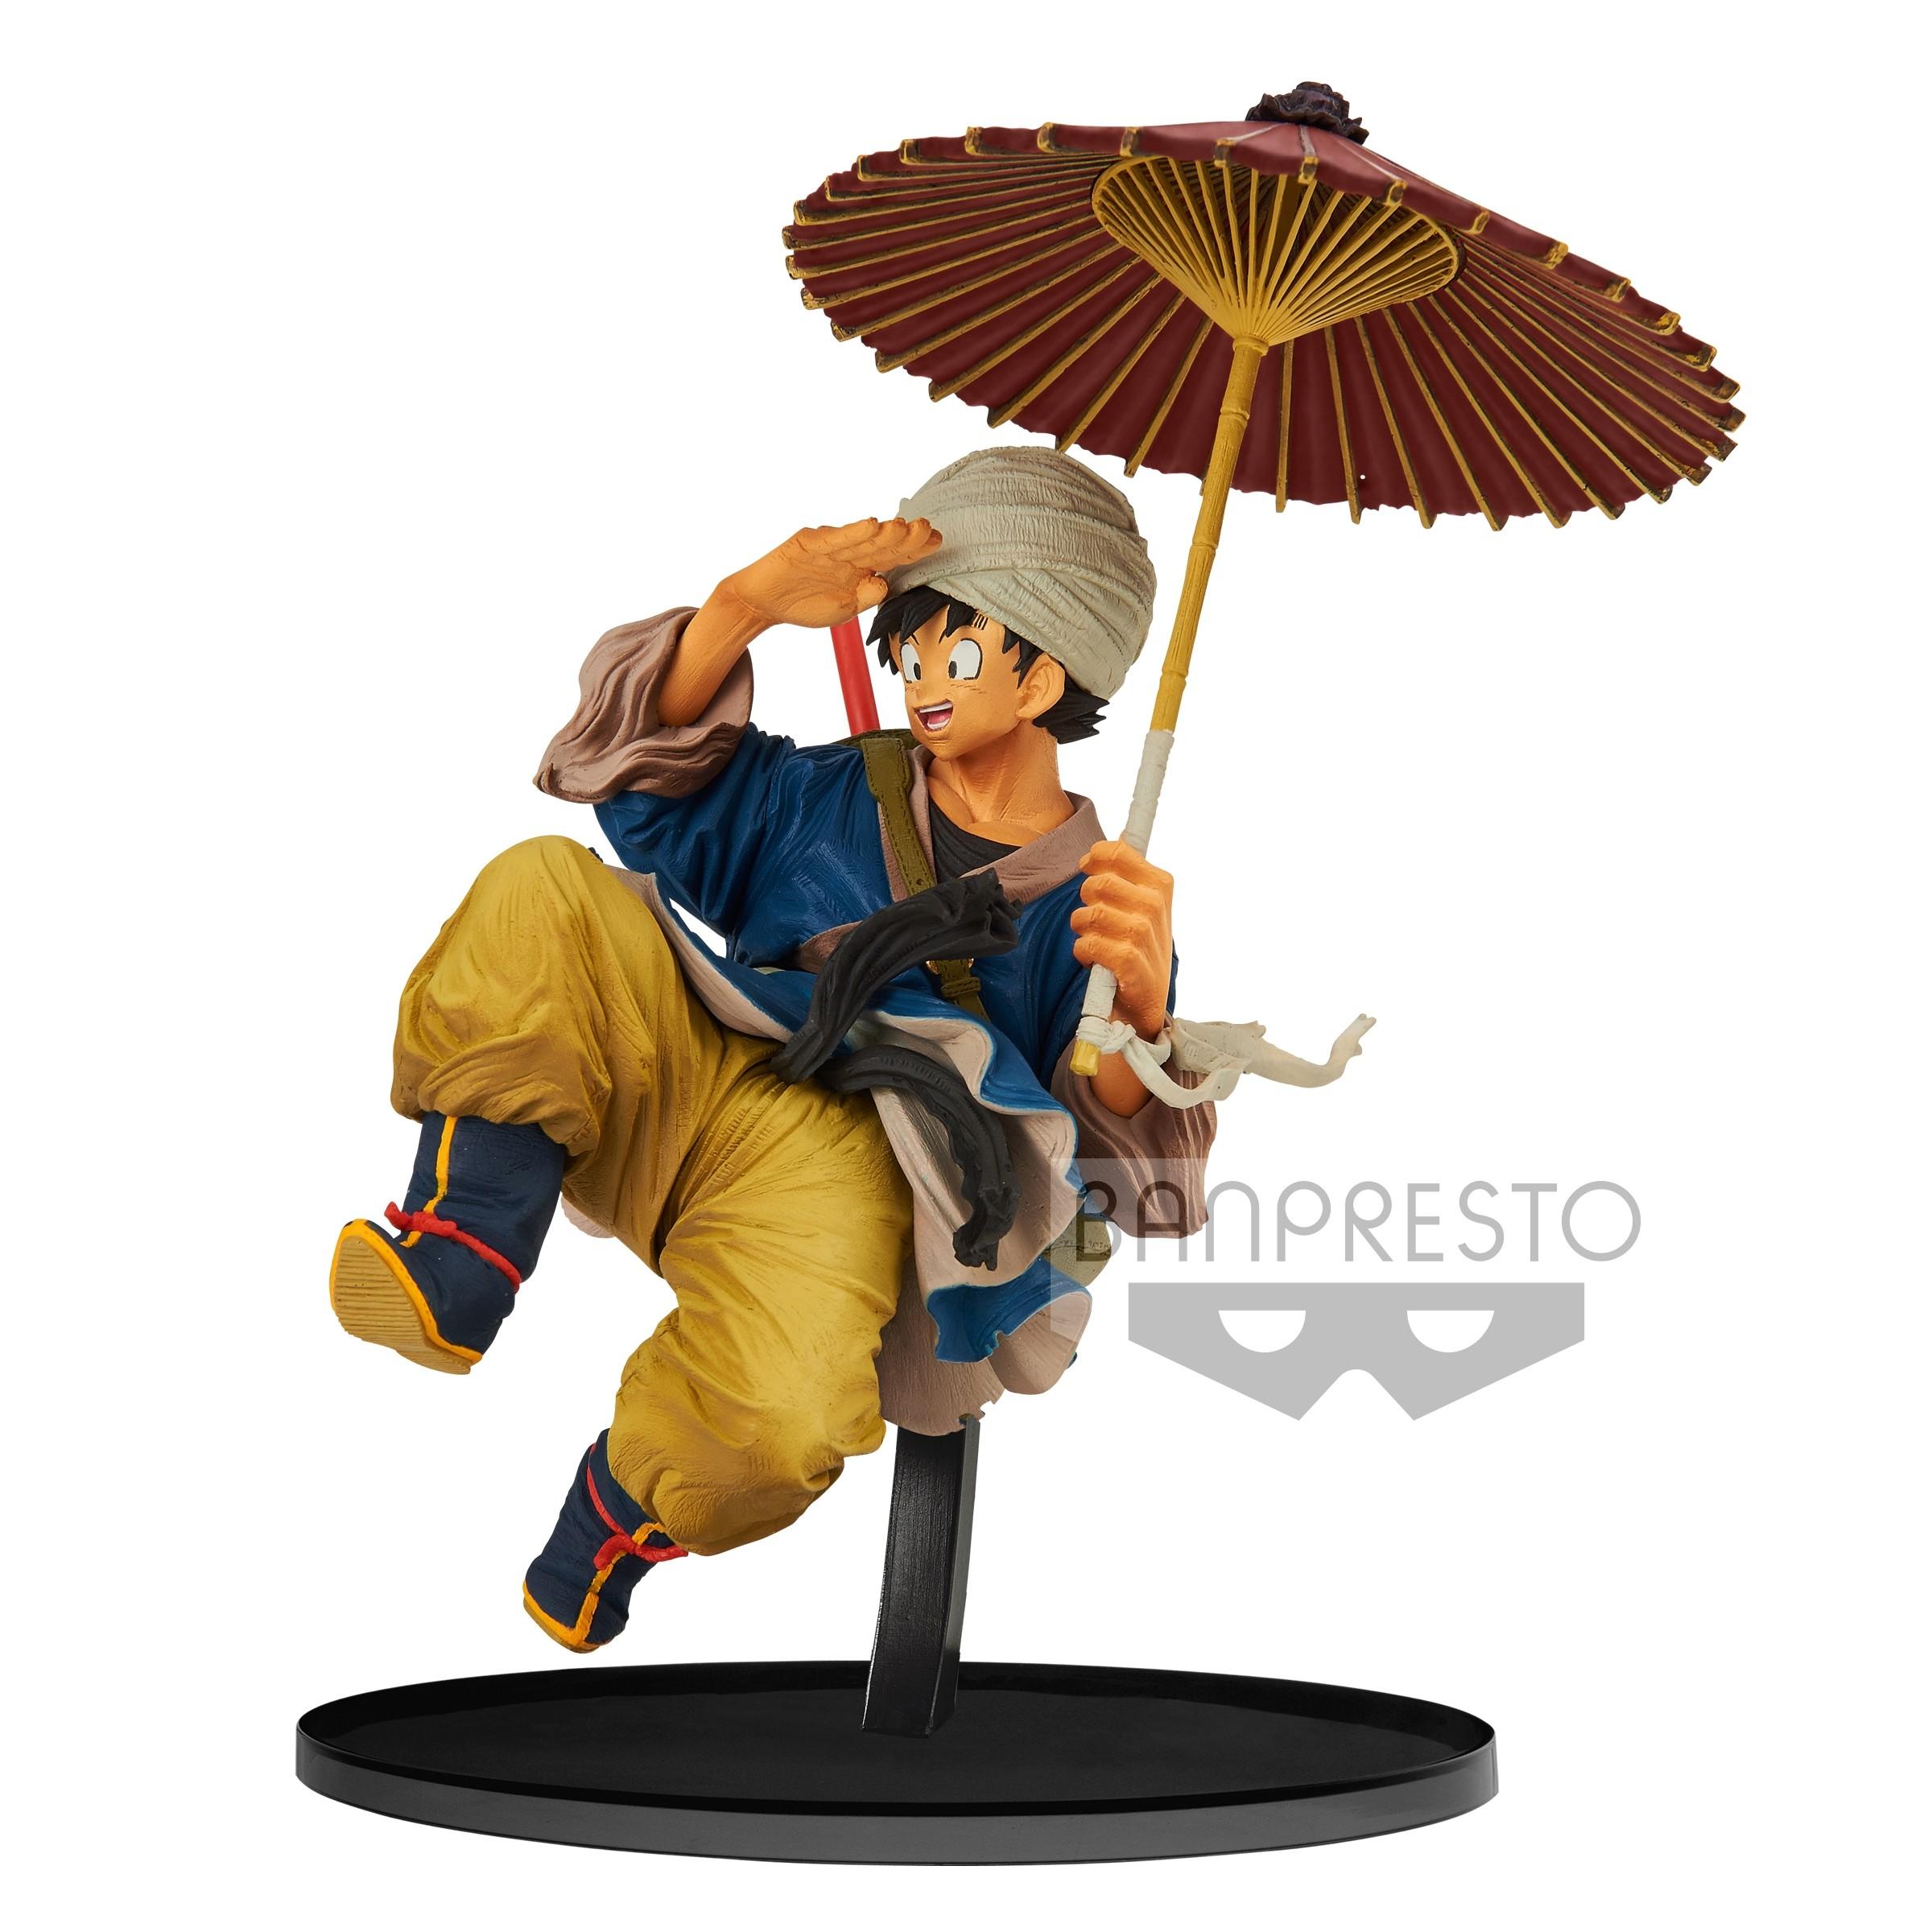 Dragon Ball Z Figure Banpresto World Figure Colosseum Vol. 6 Son Goku